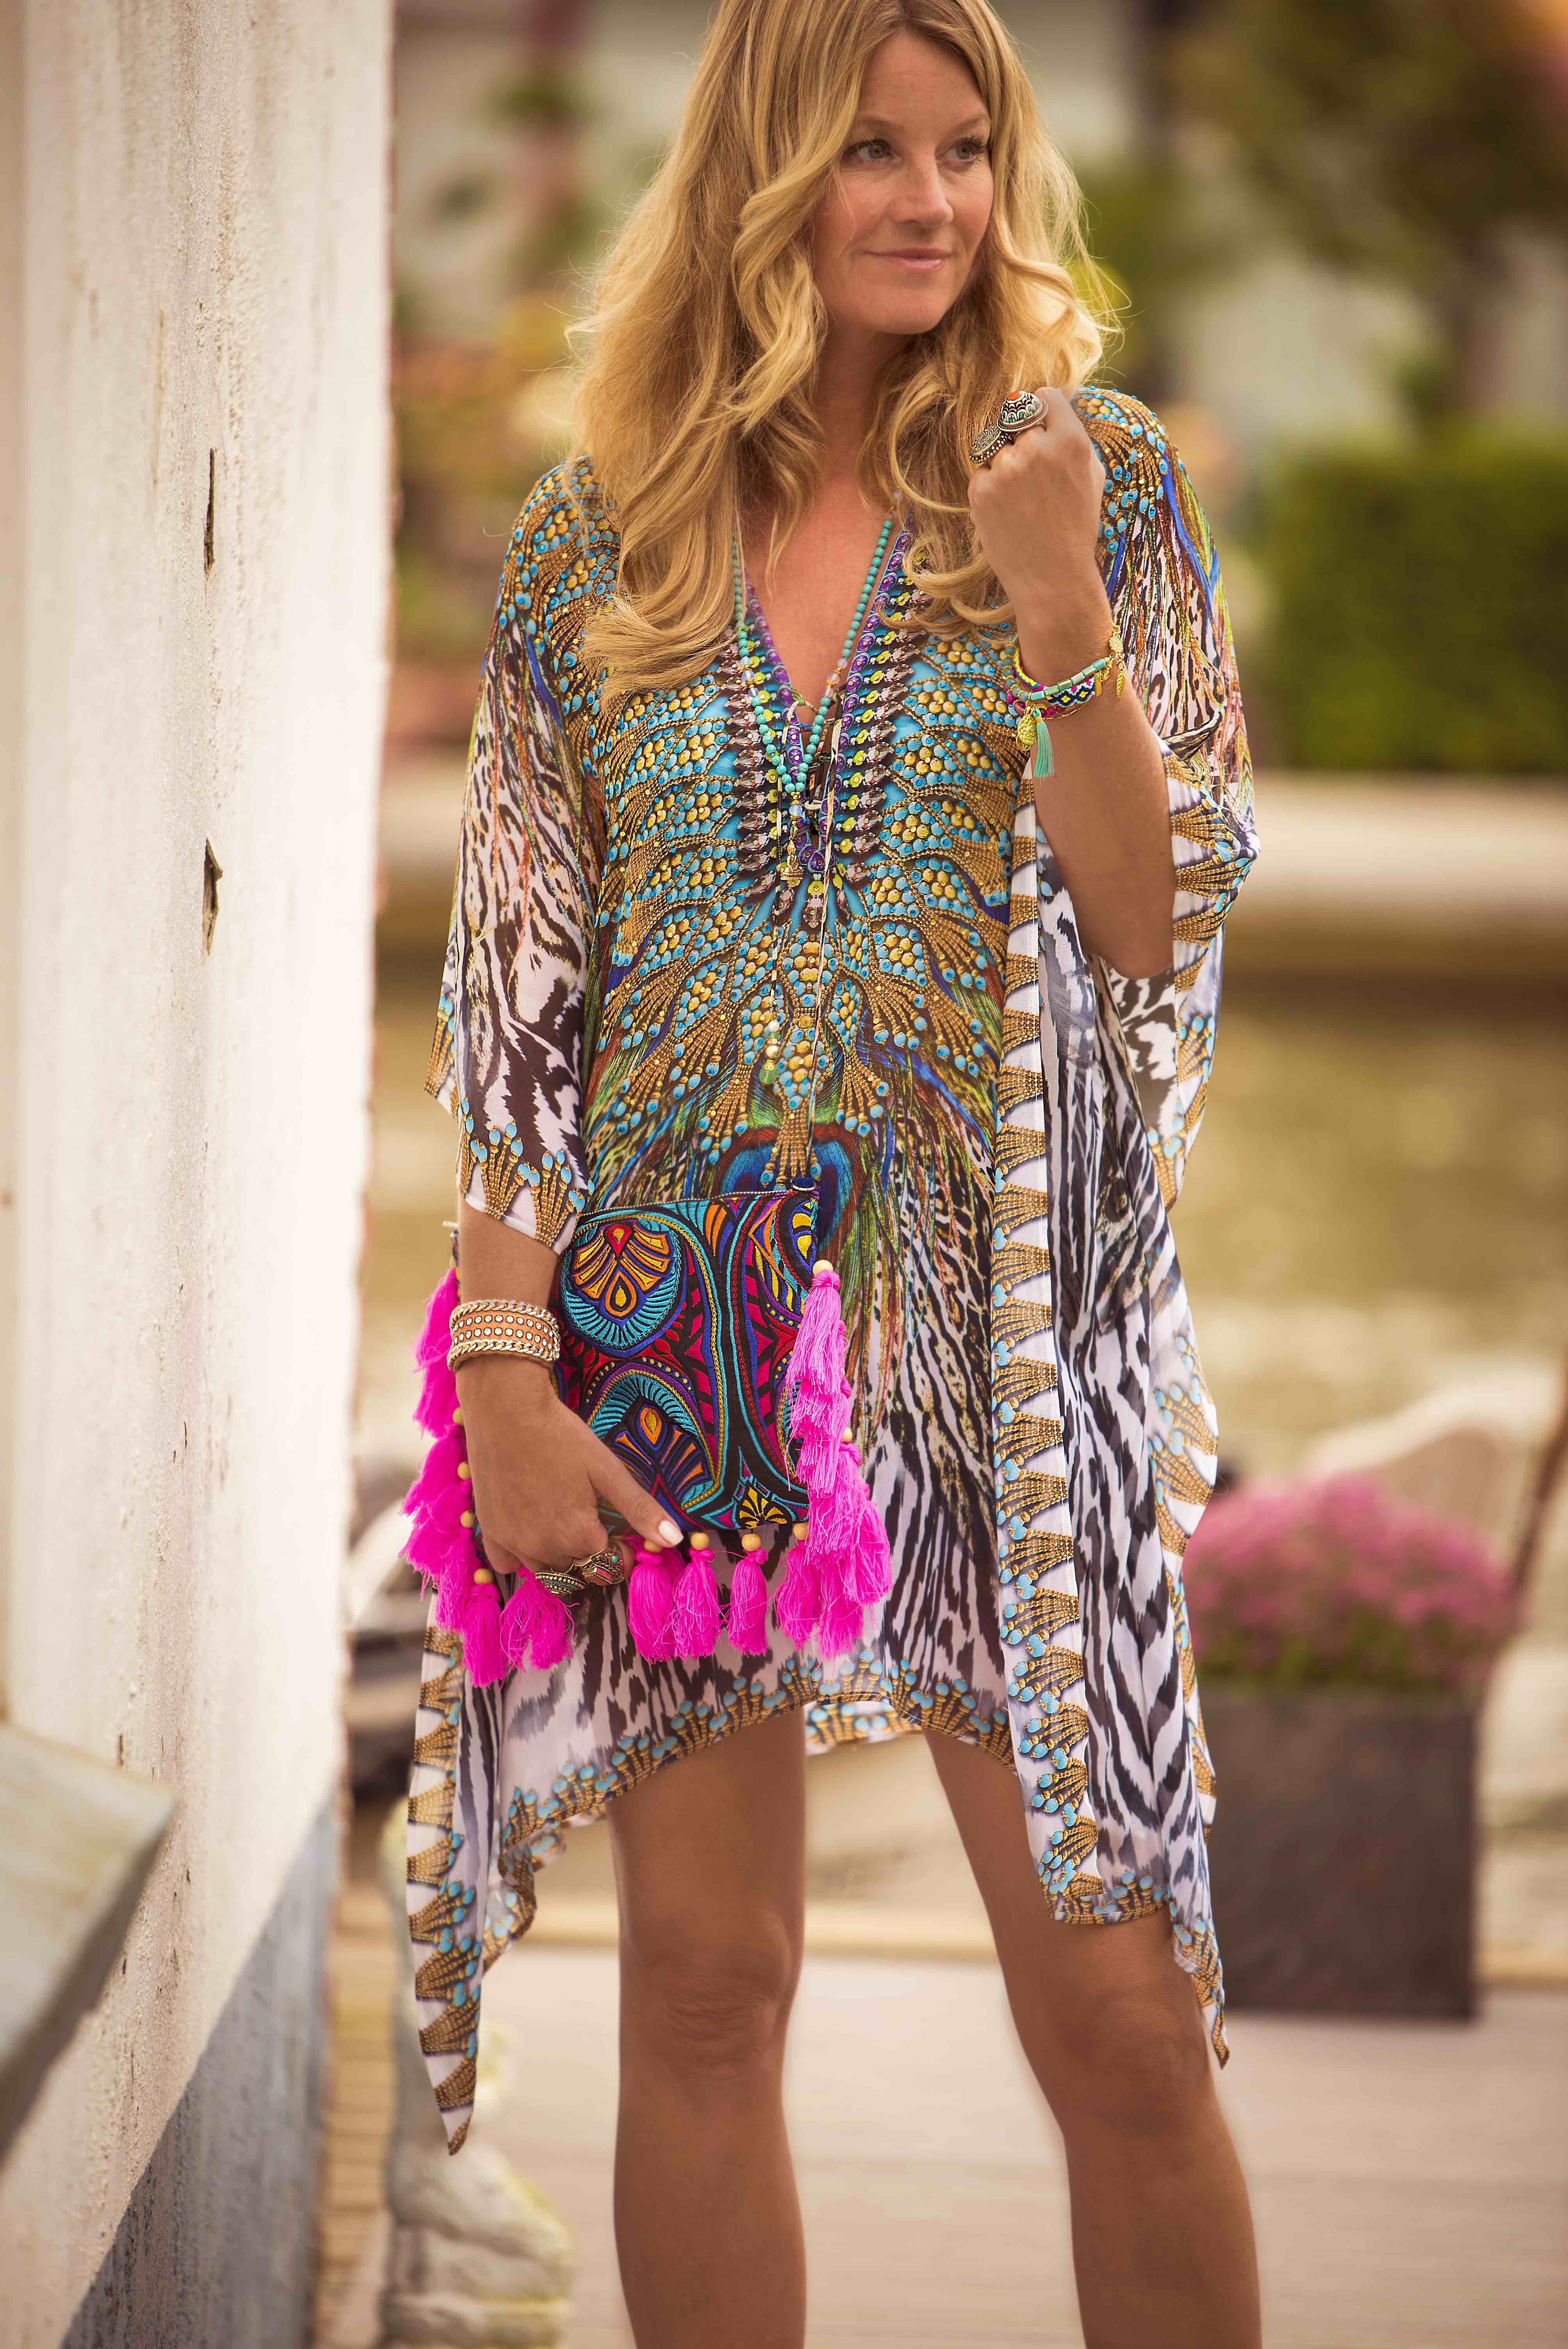 Summer Boho style exclusive photo